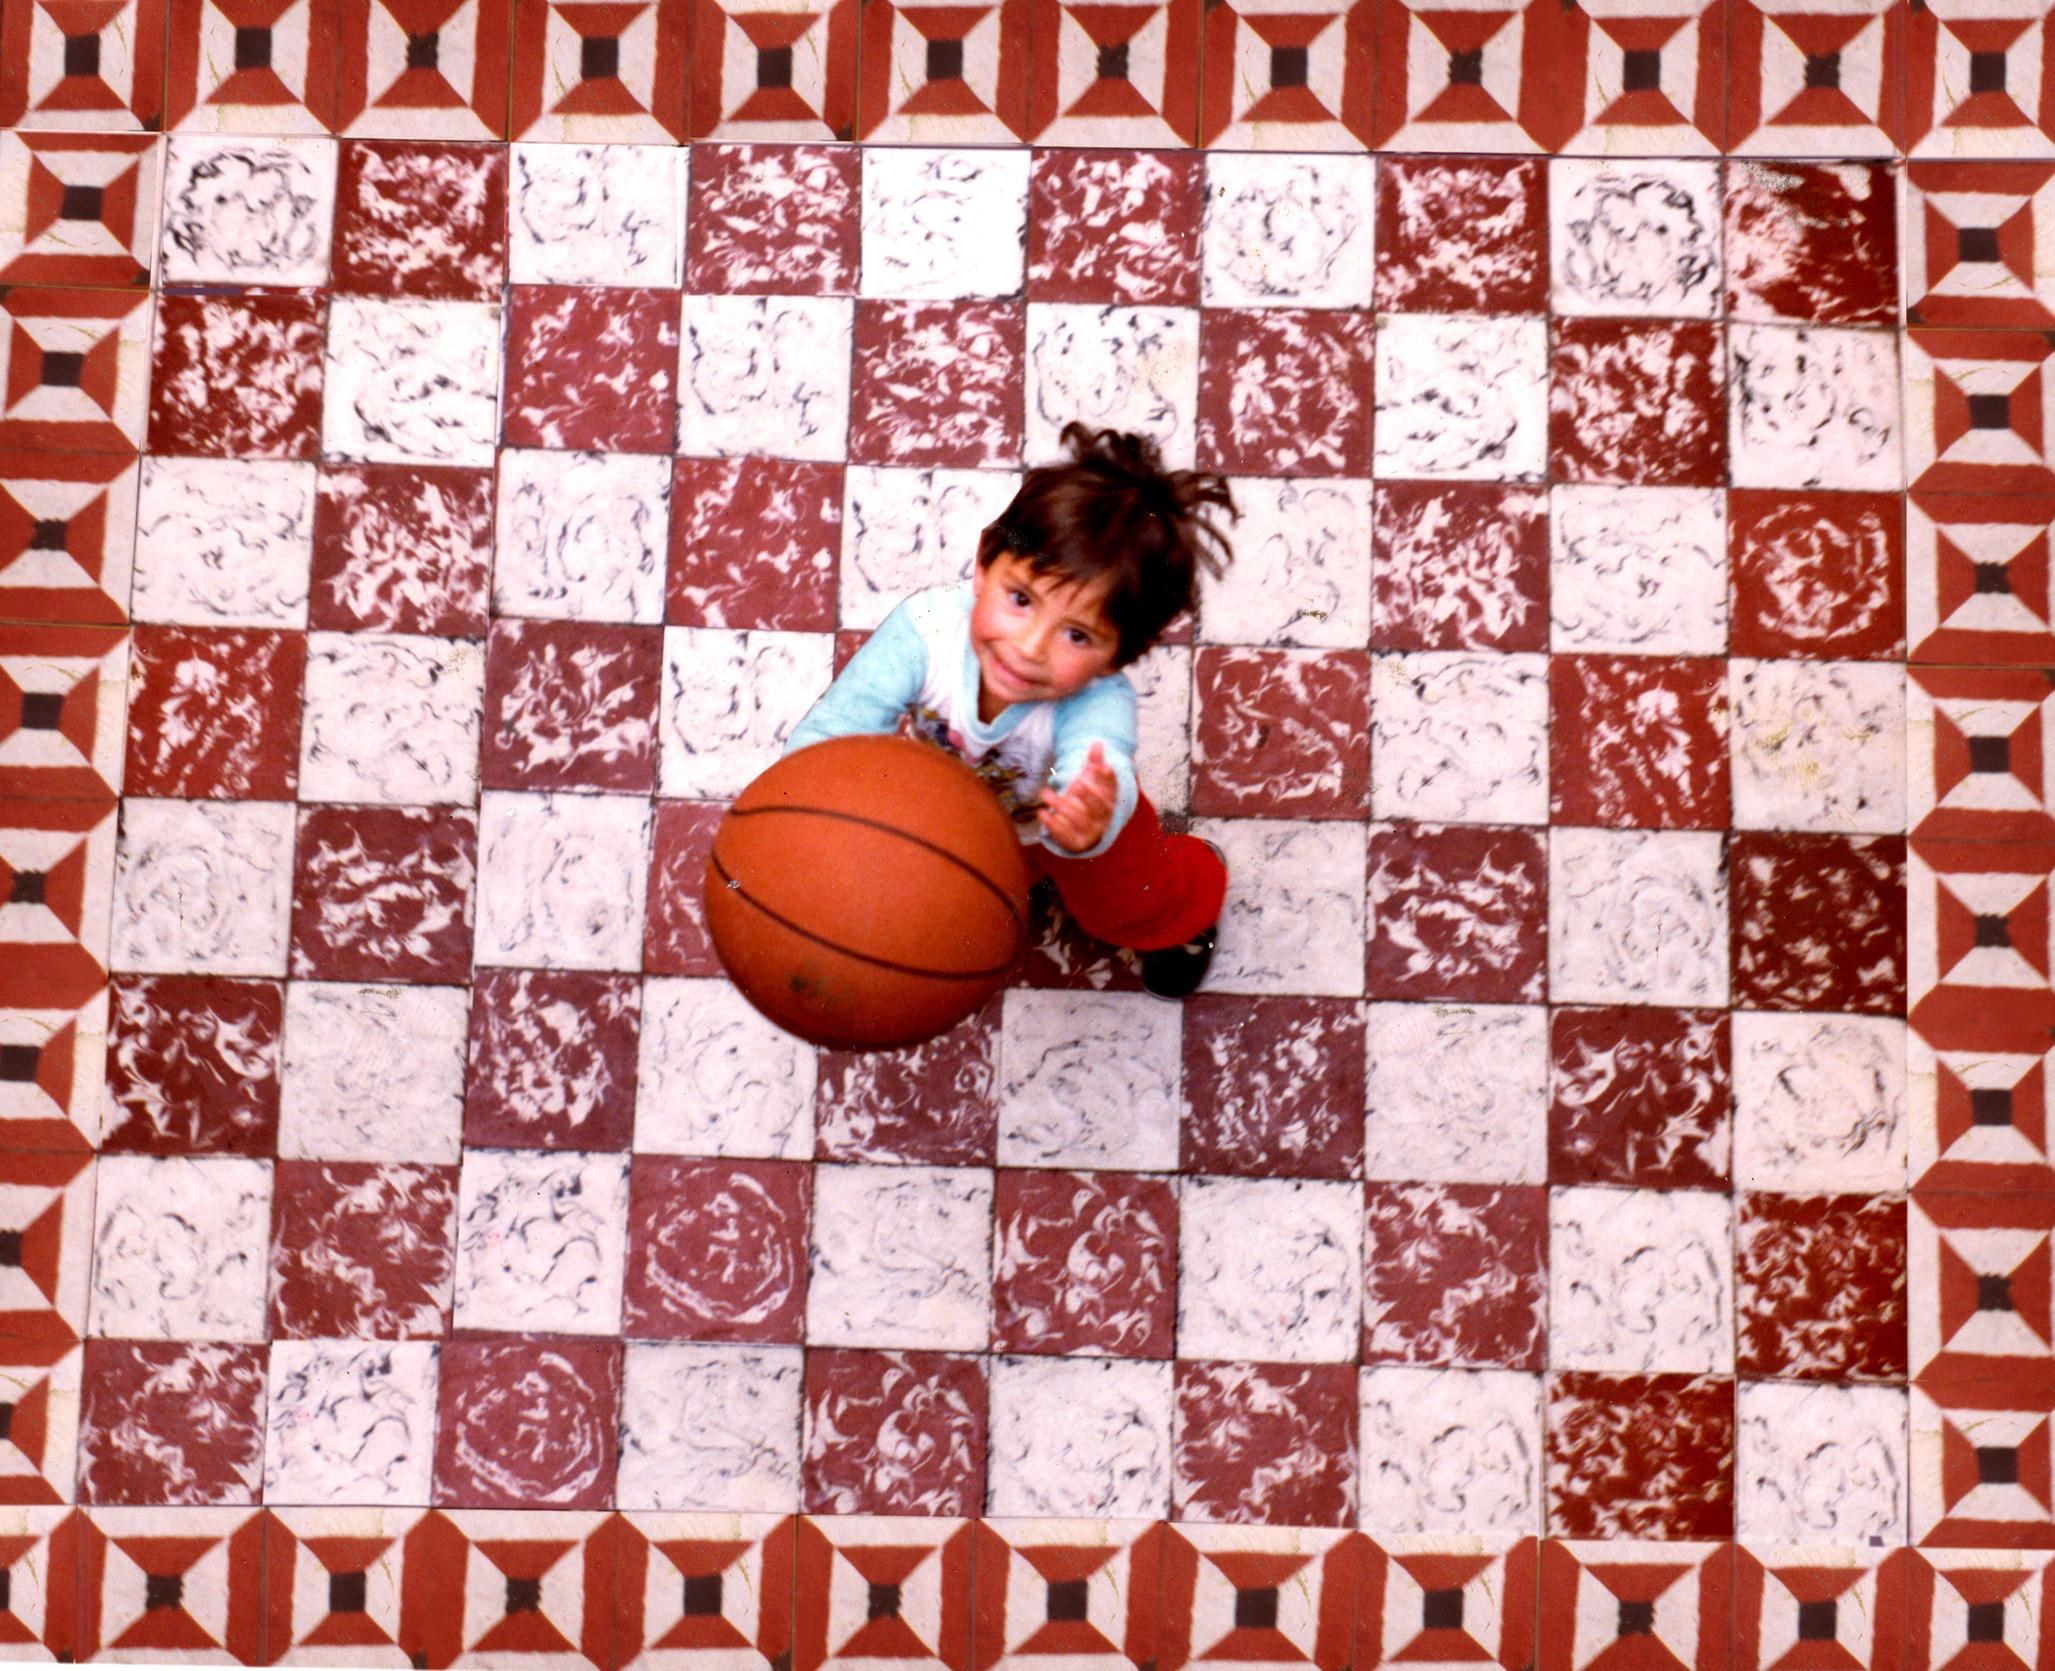 Tiles, Ball and a Girl Original